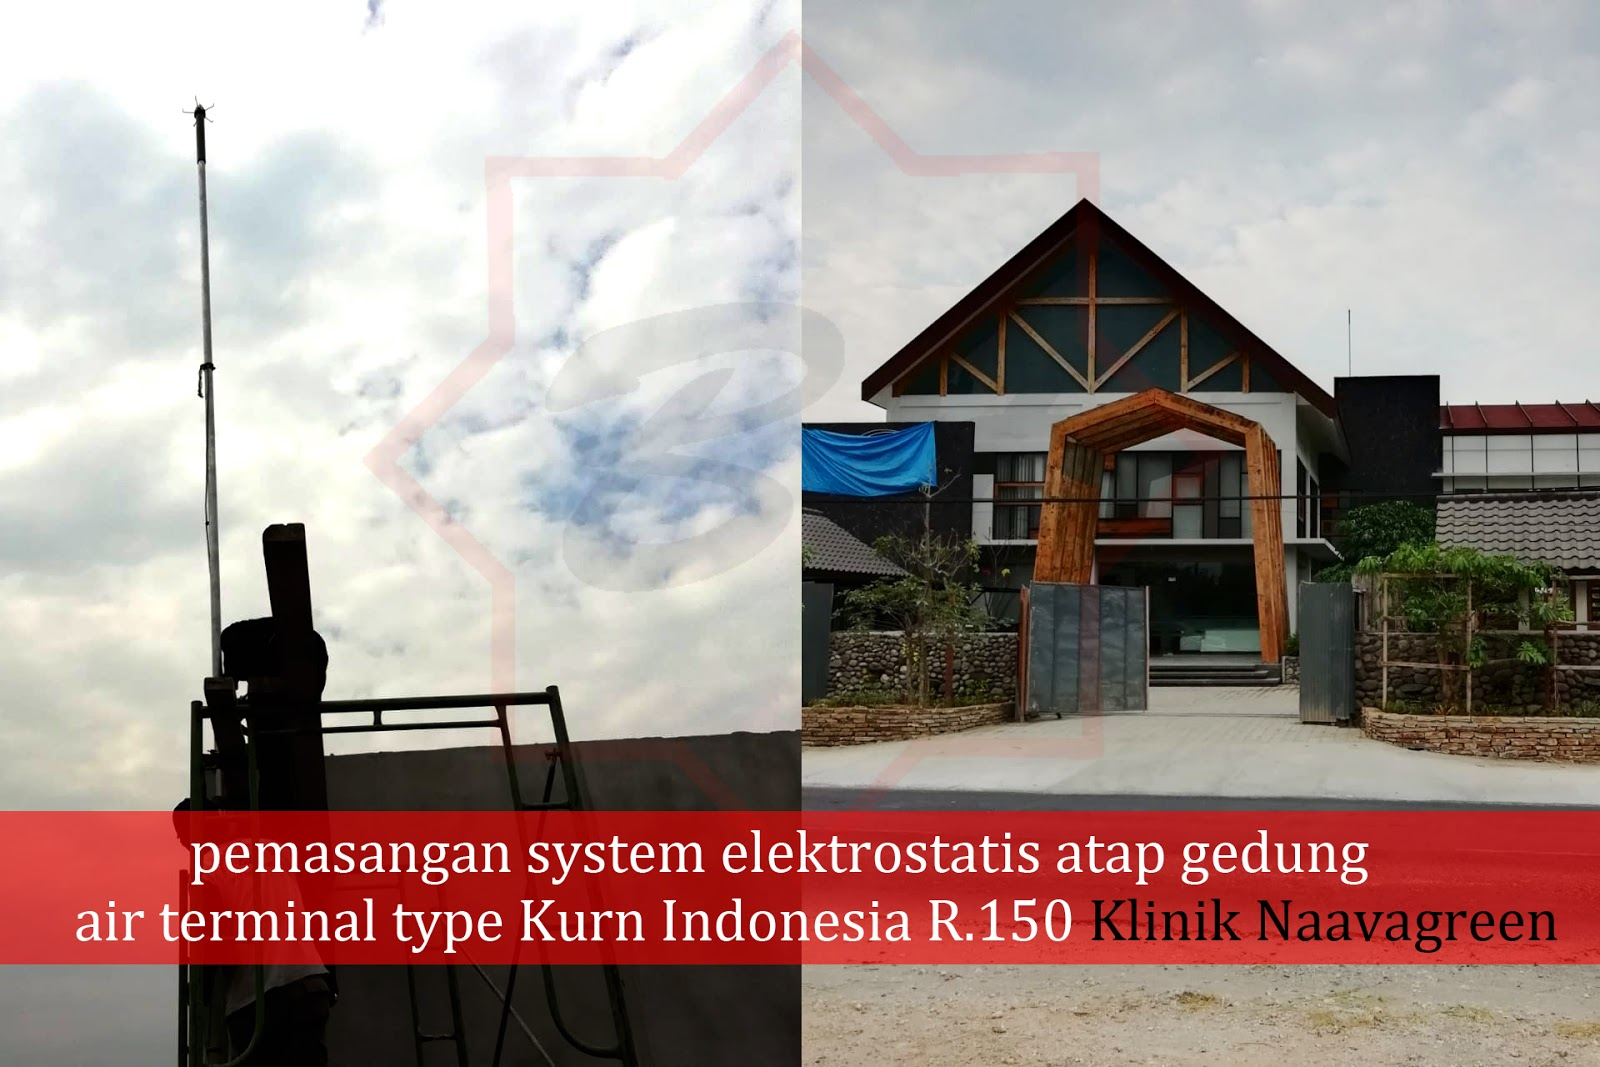 Pemasangan Penangkal Petir Type Kurn Indonesia R.150